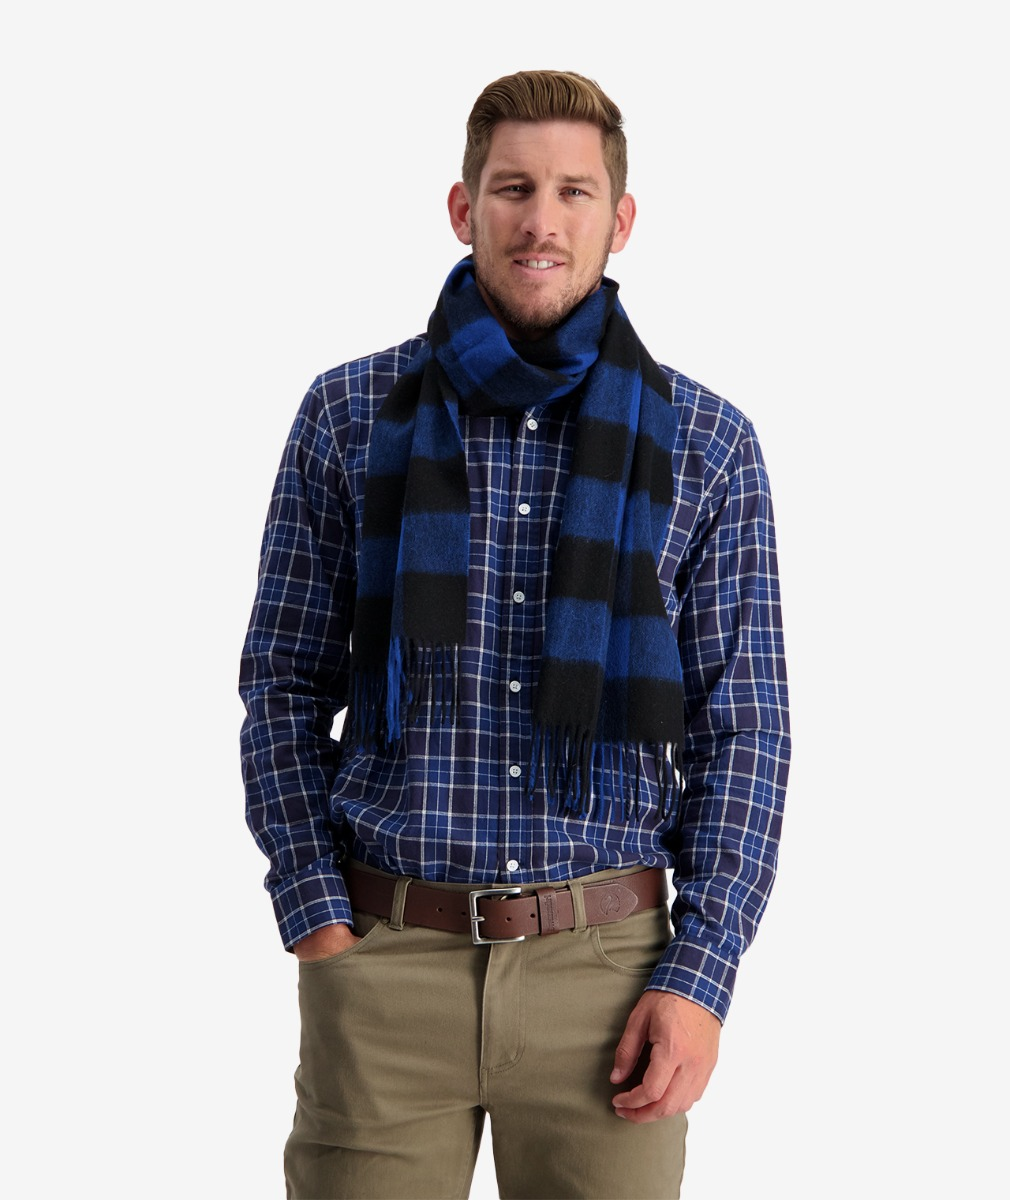 Swanndri Unisex 100% Wool Scarfie in Blue/Black Check